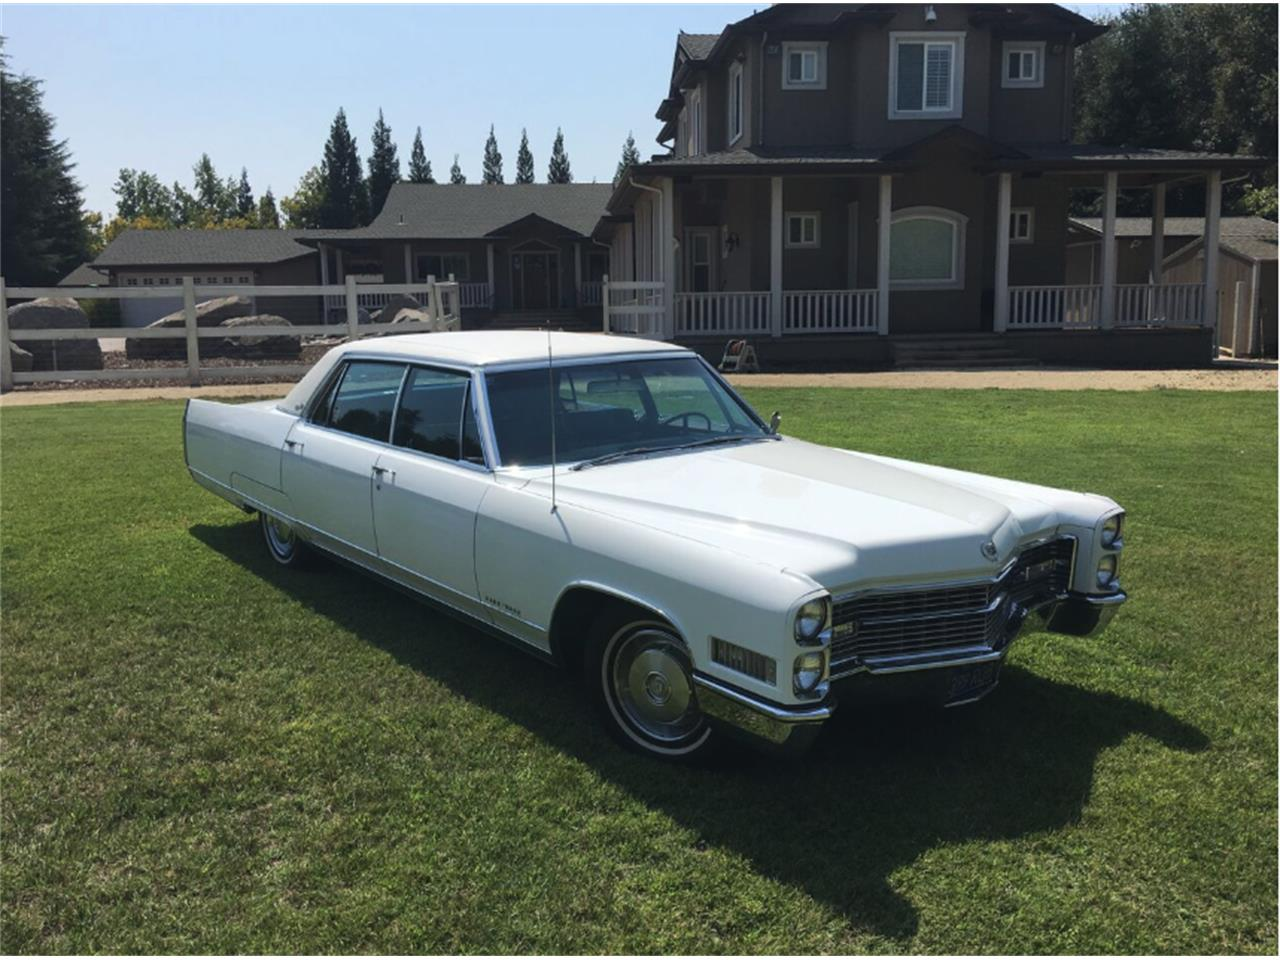 Future Ford Sacramento >> 1966 Cadillac Fleetwood Brougham for Sale | ClassicCars ...